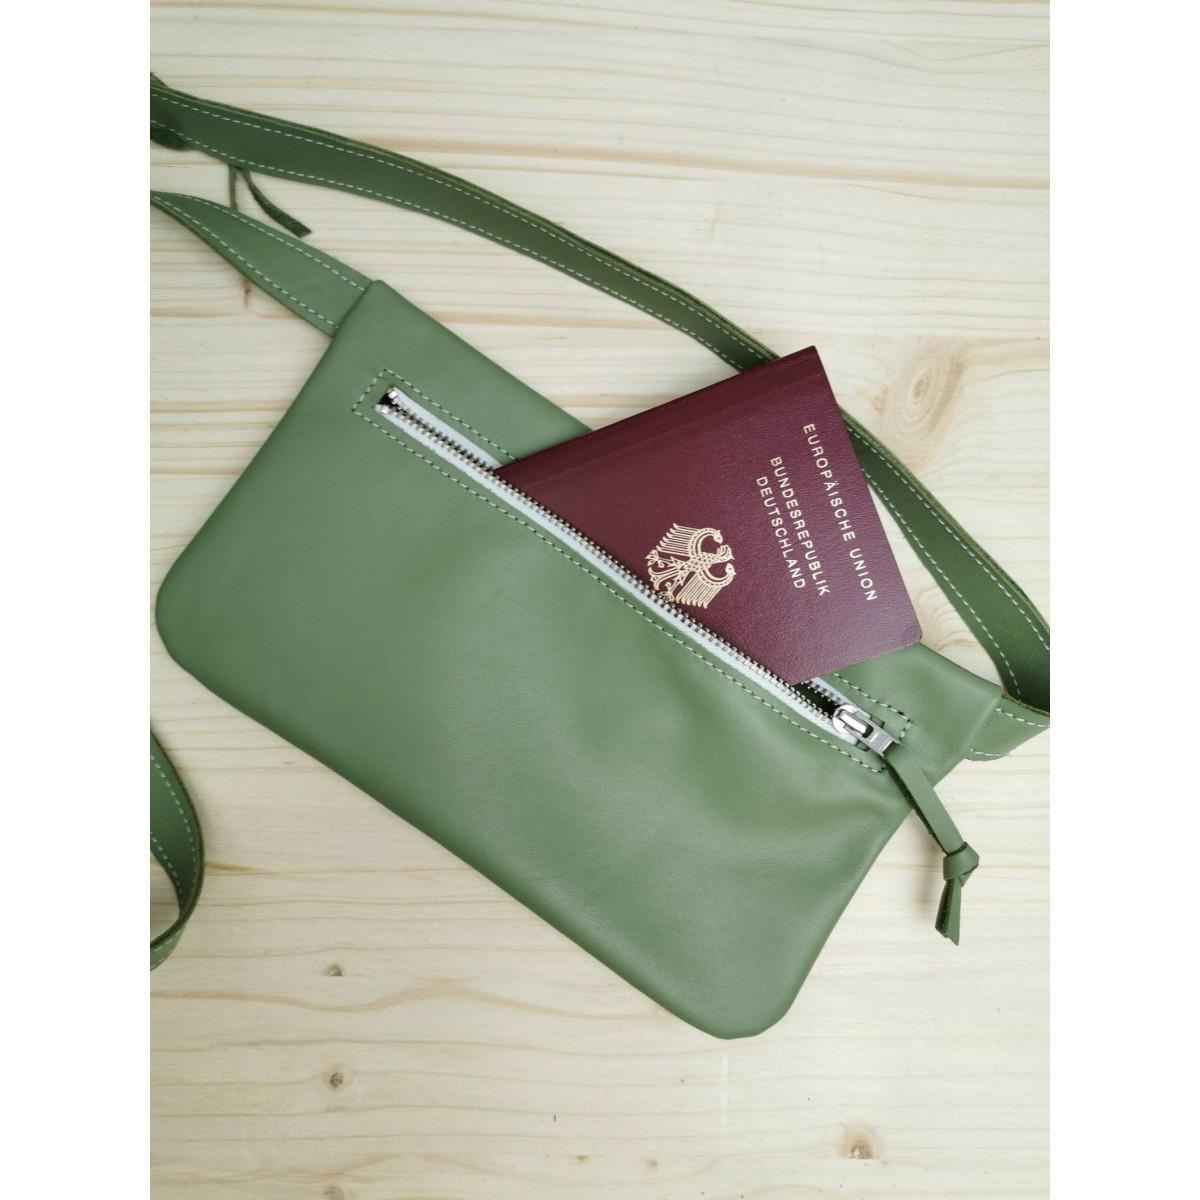 Grüne Leder Gürteltasche // Hüfttasche Mintgrün // Hip bag leather // Fanny Pack // Crossbody // Festival Bag // Bauchtasche // Boom bag